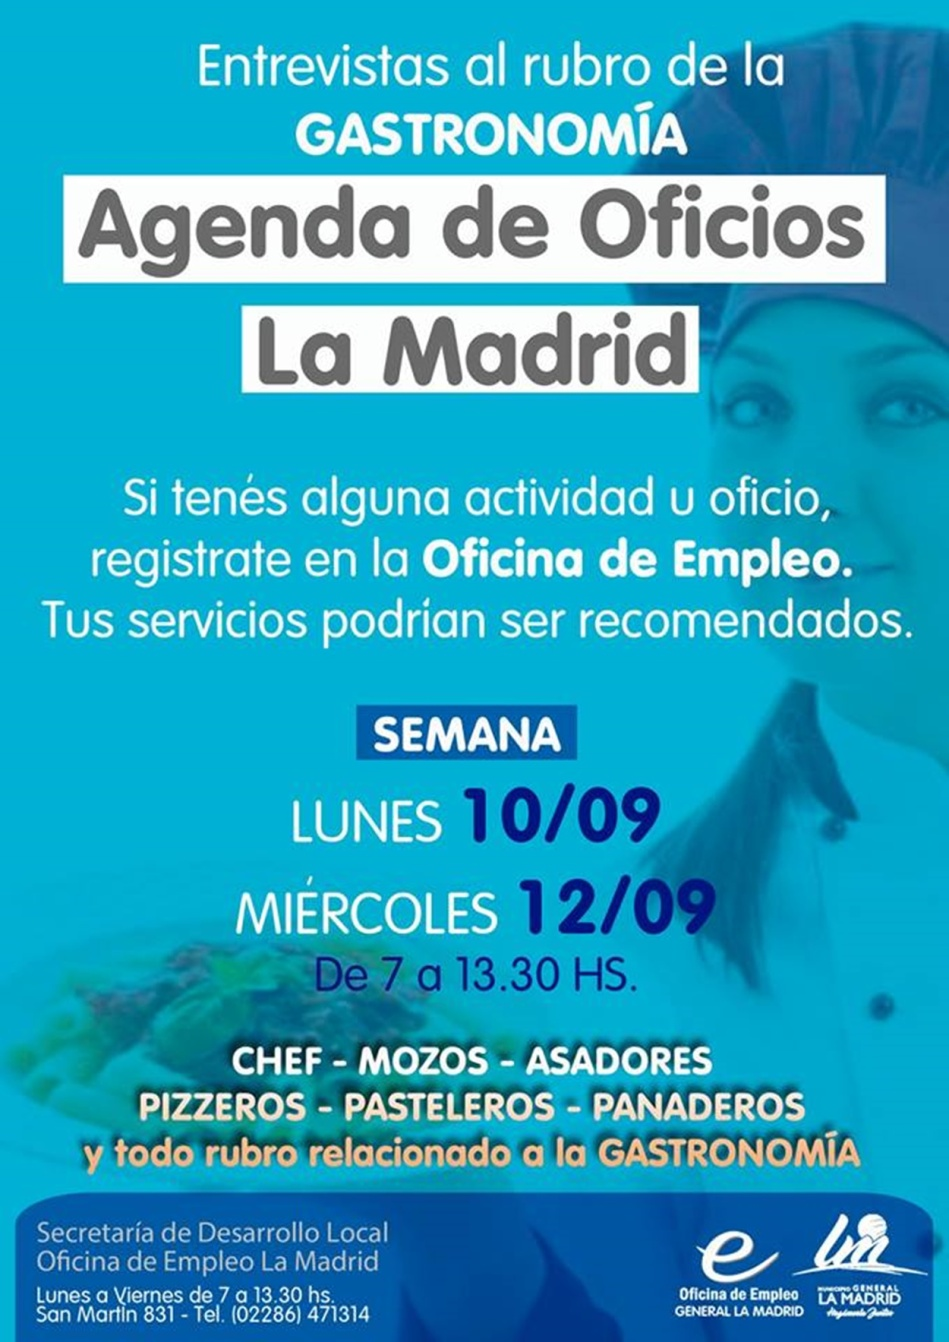 AGENDA DE OFICIOS.jpg